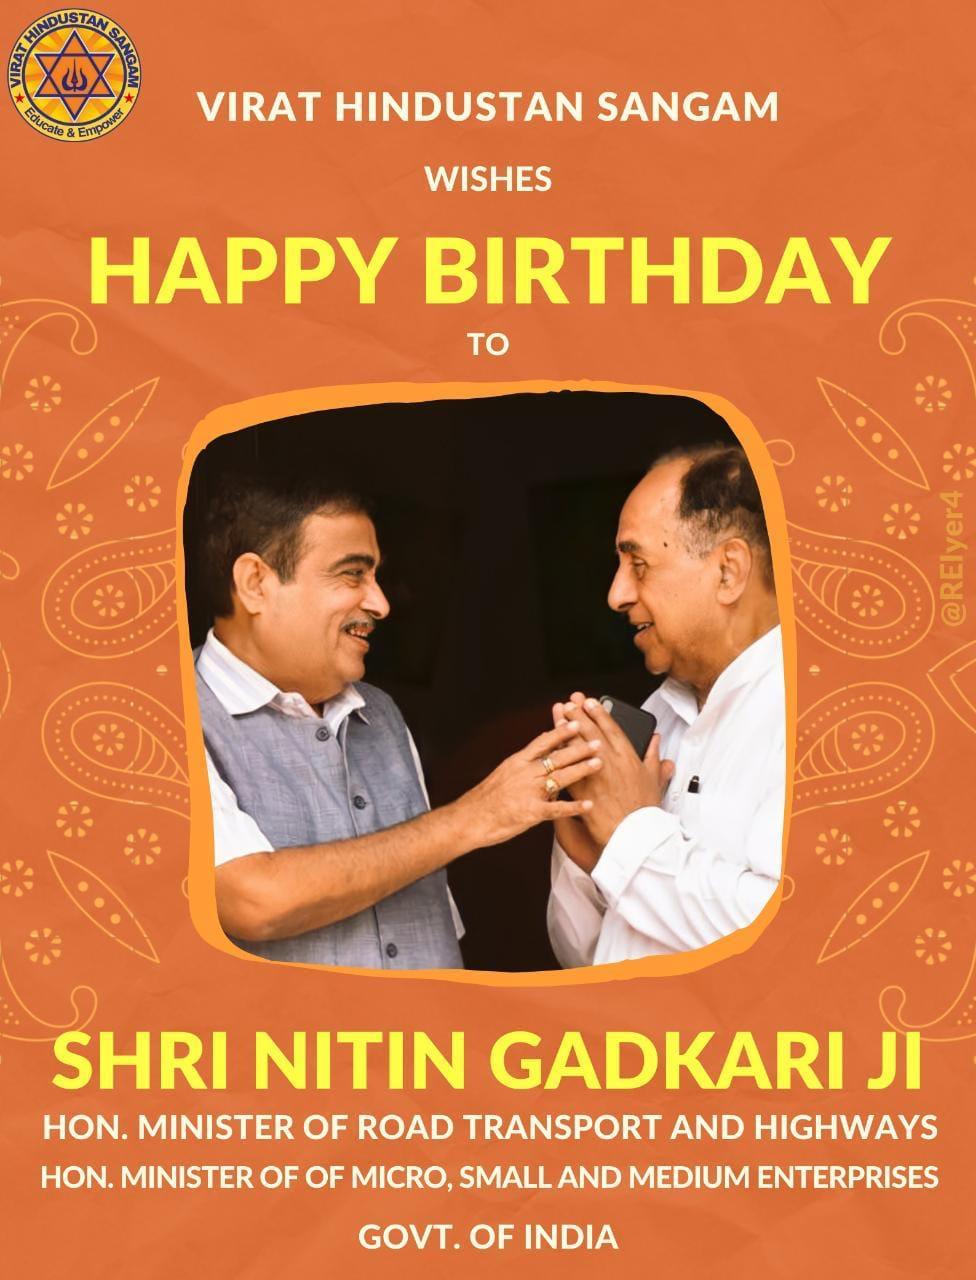 wishes Happy Birthday to Sri ji